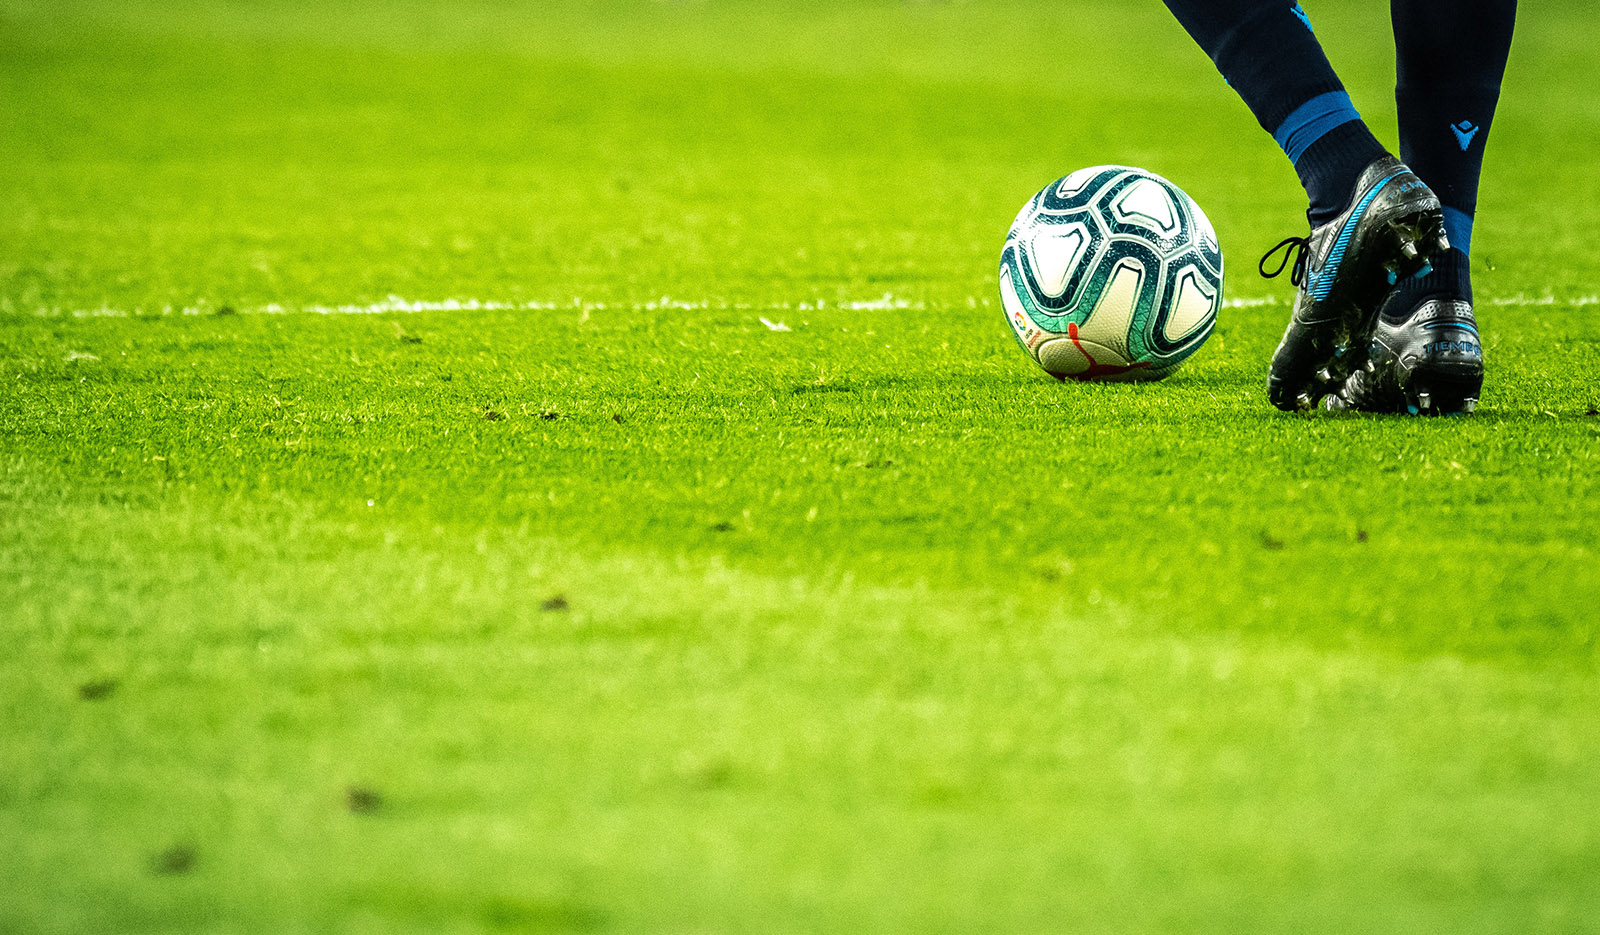 Fotbollens baksidor